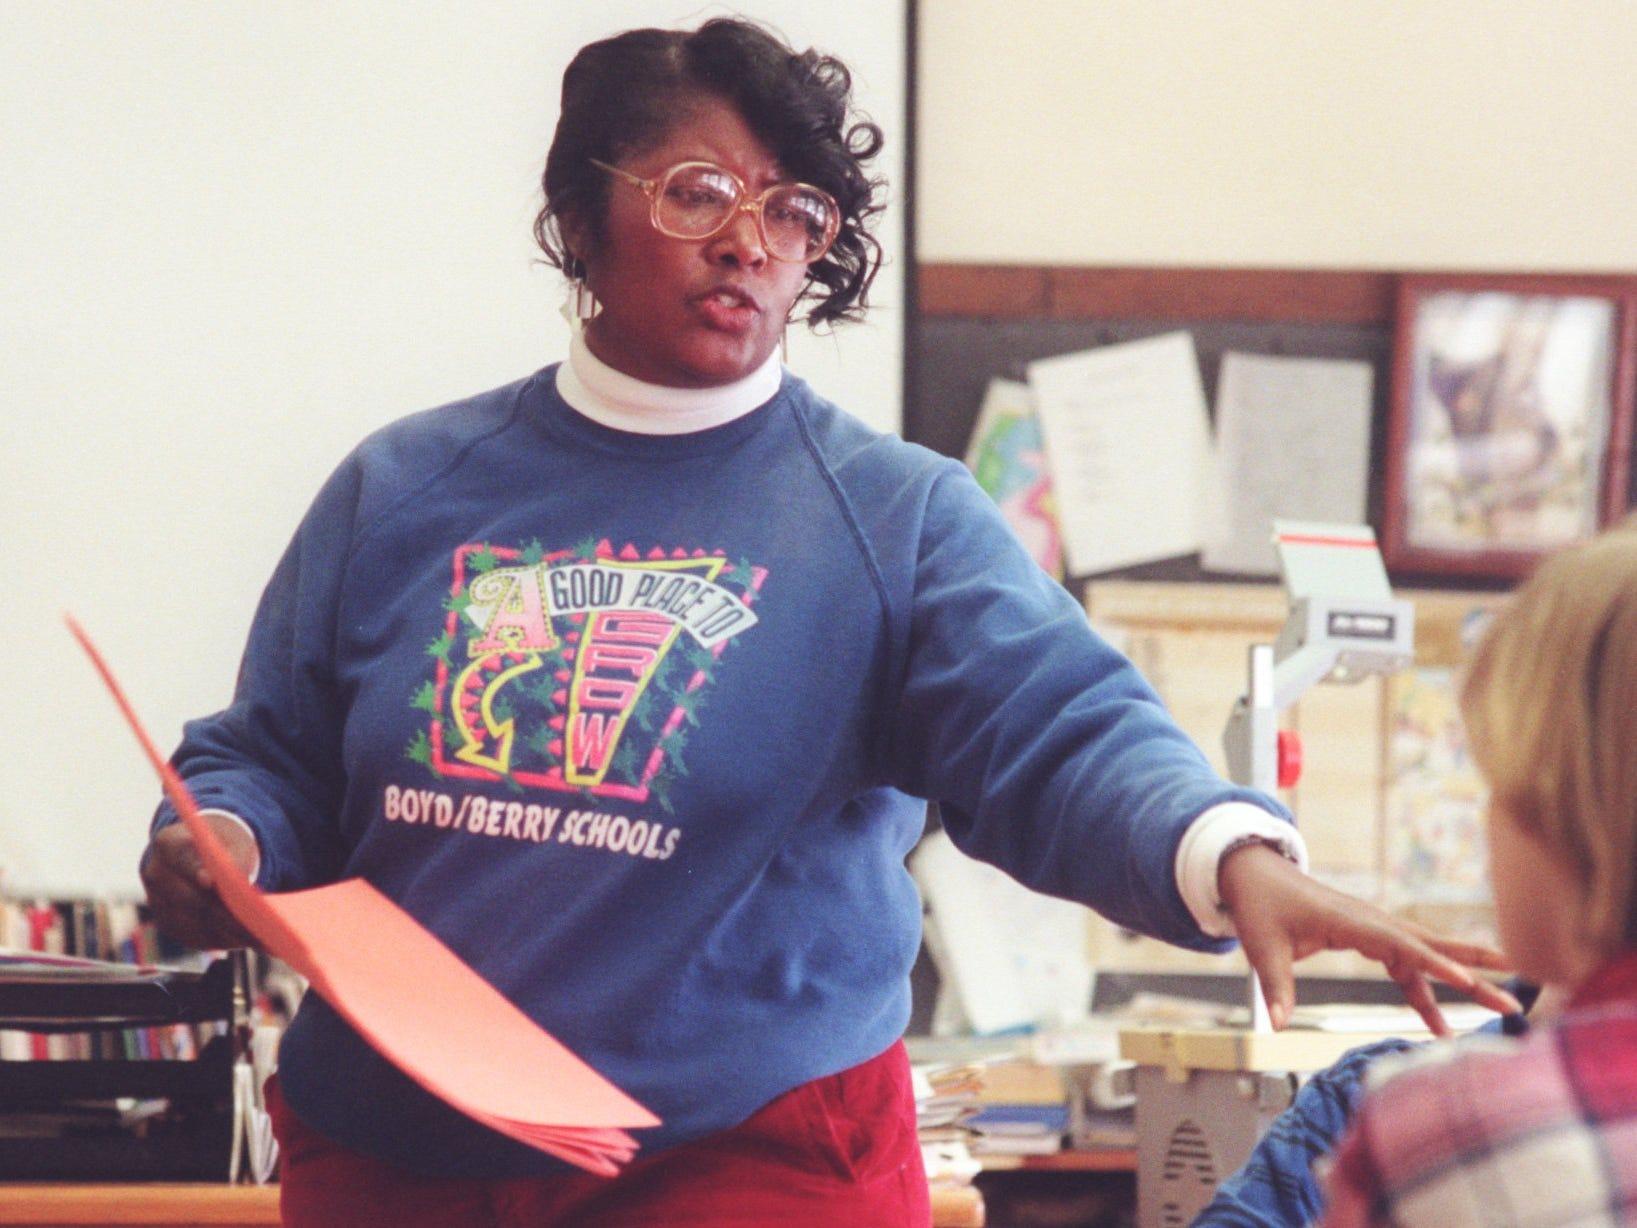 Boyd Elementary School teacher Maxine Smith stresses teaching black history throughout the school year.